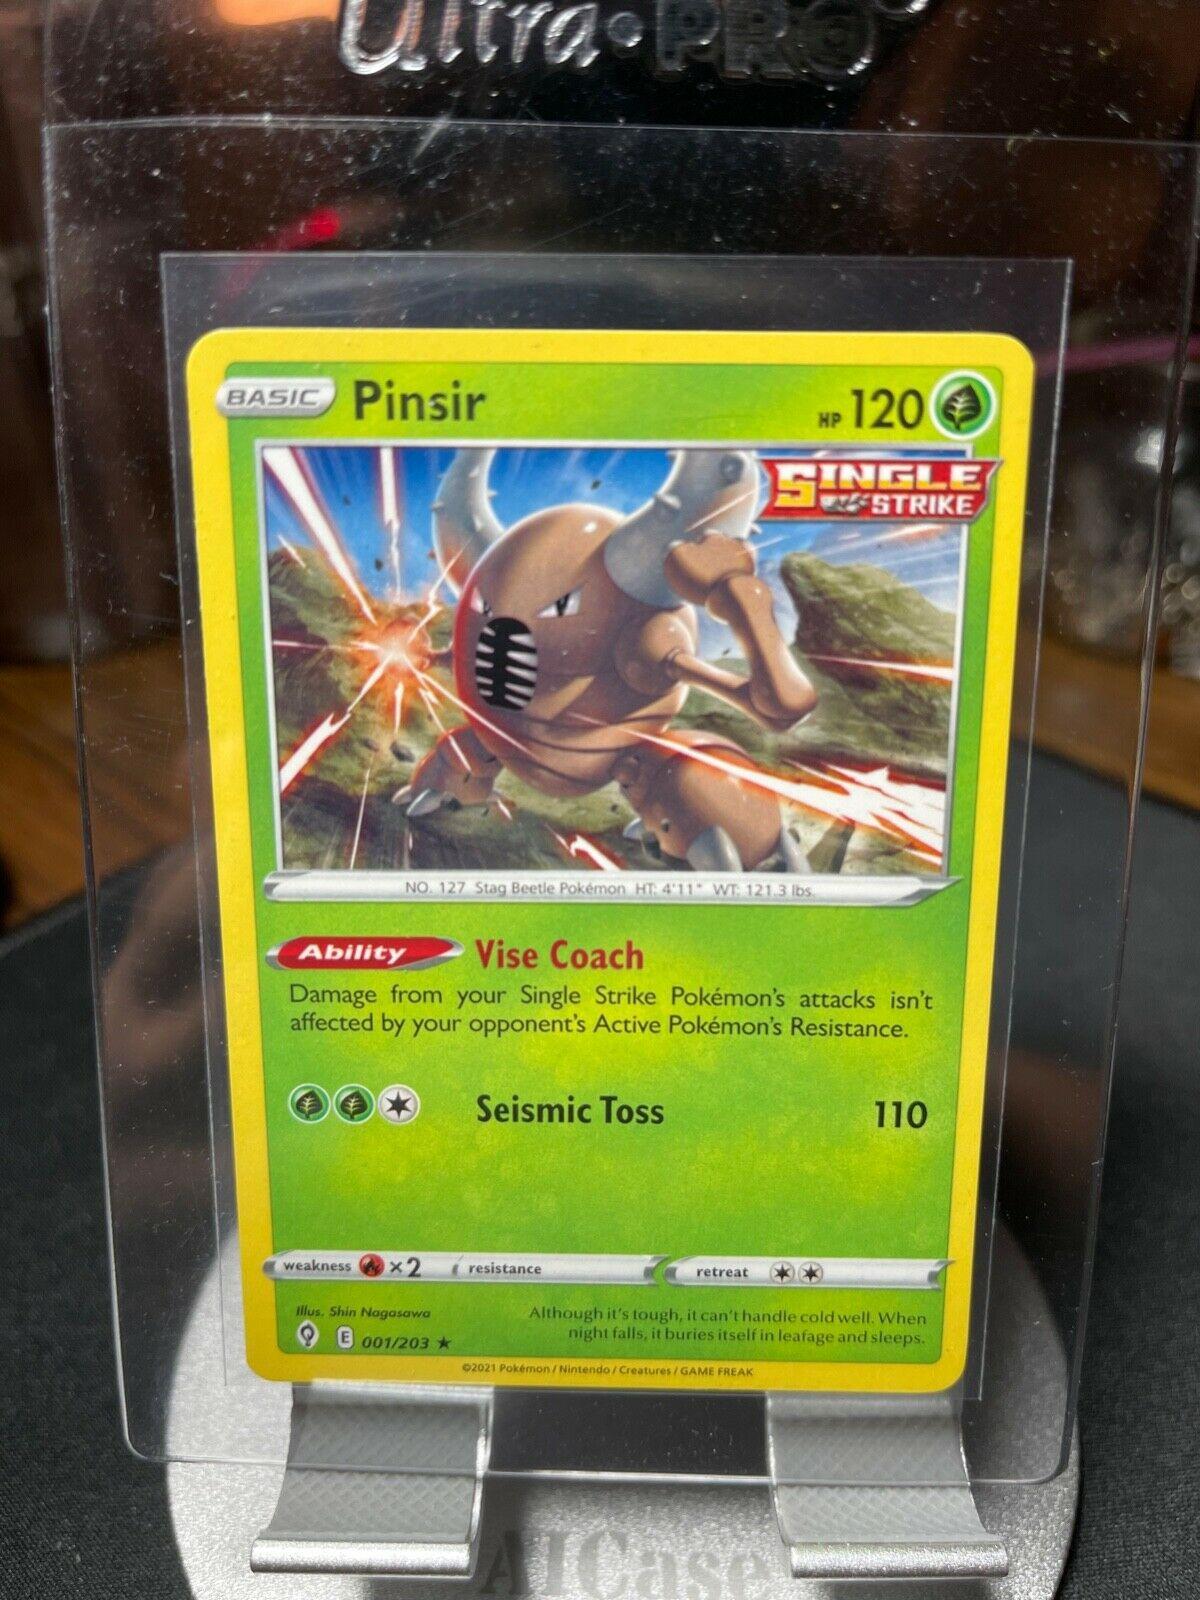 Pinsir (001/203) [Sword & Shield: Evolving Skies] Rare Pokemon TCG